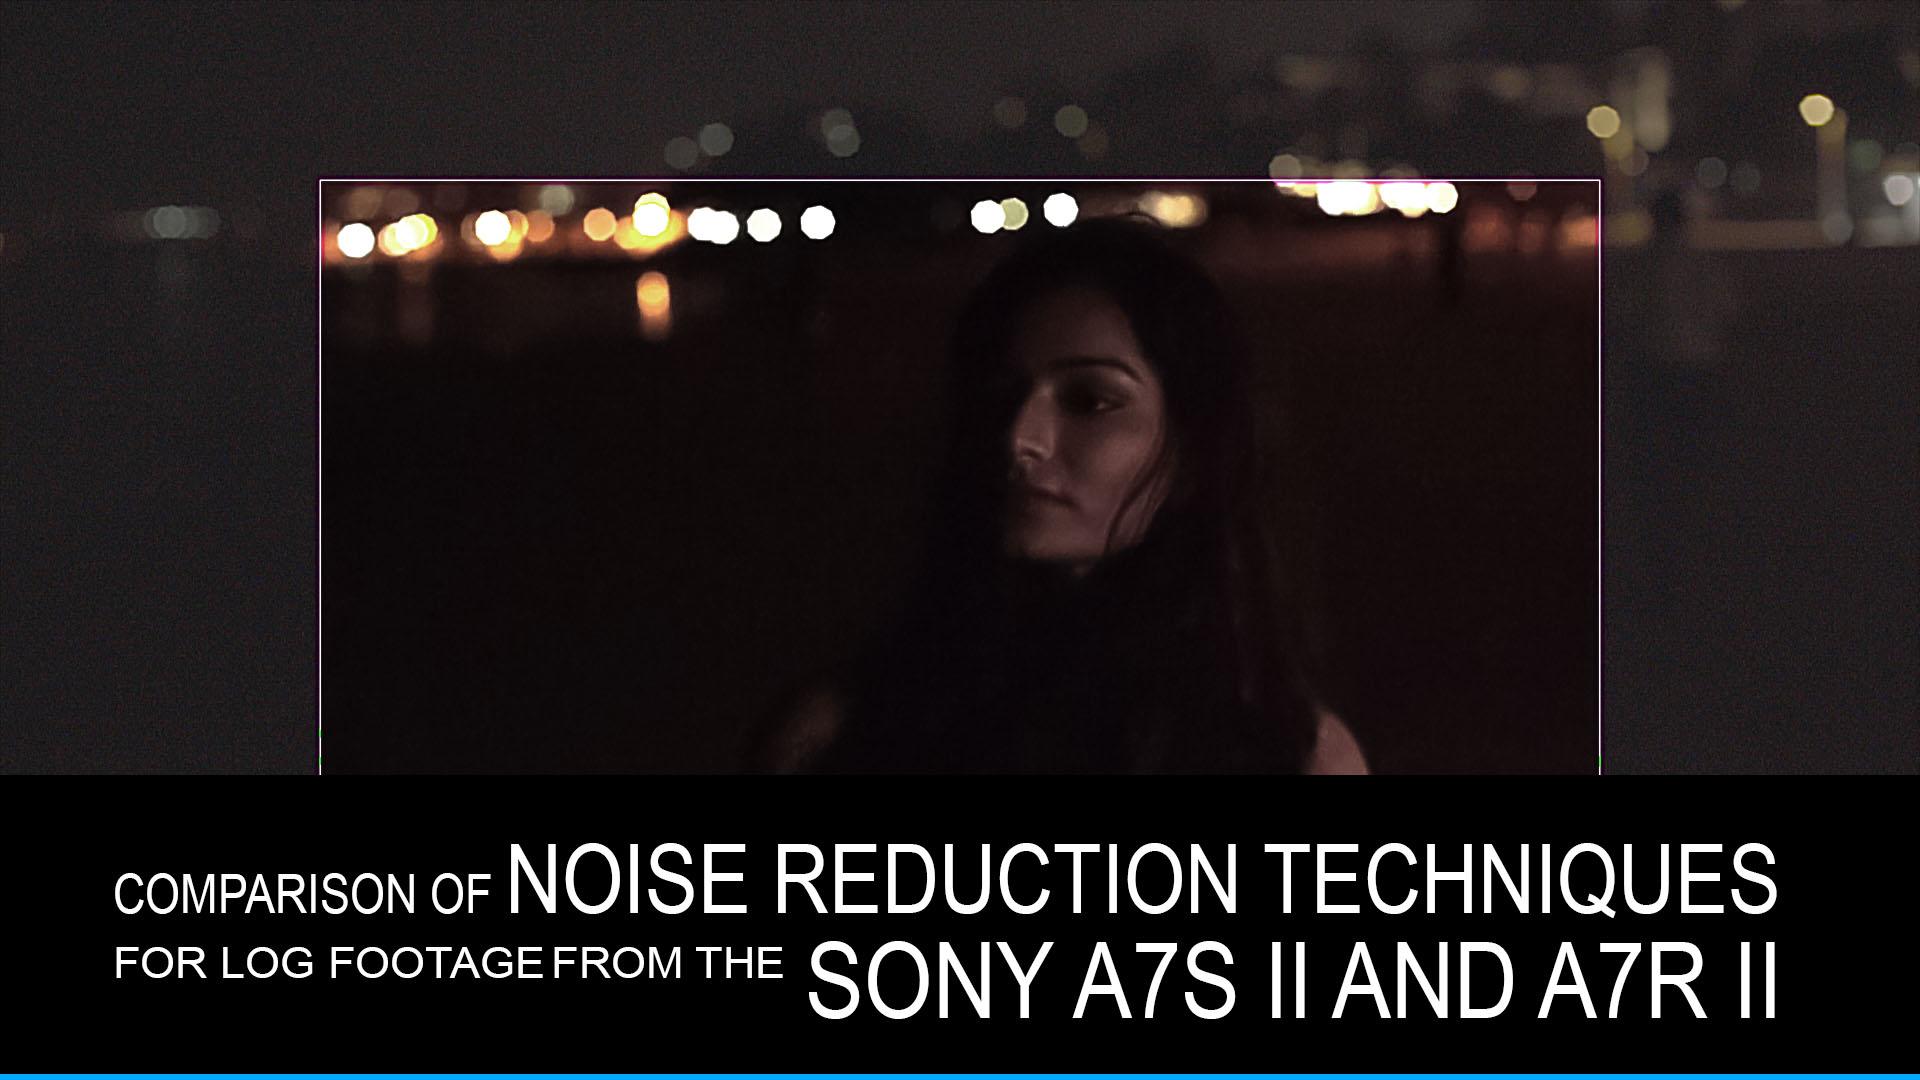 NoiseReductionLogSonya7SIIa7RII